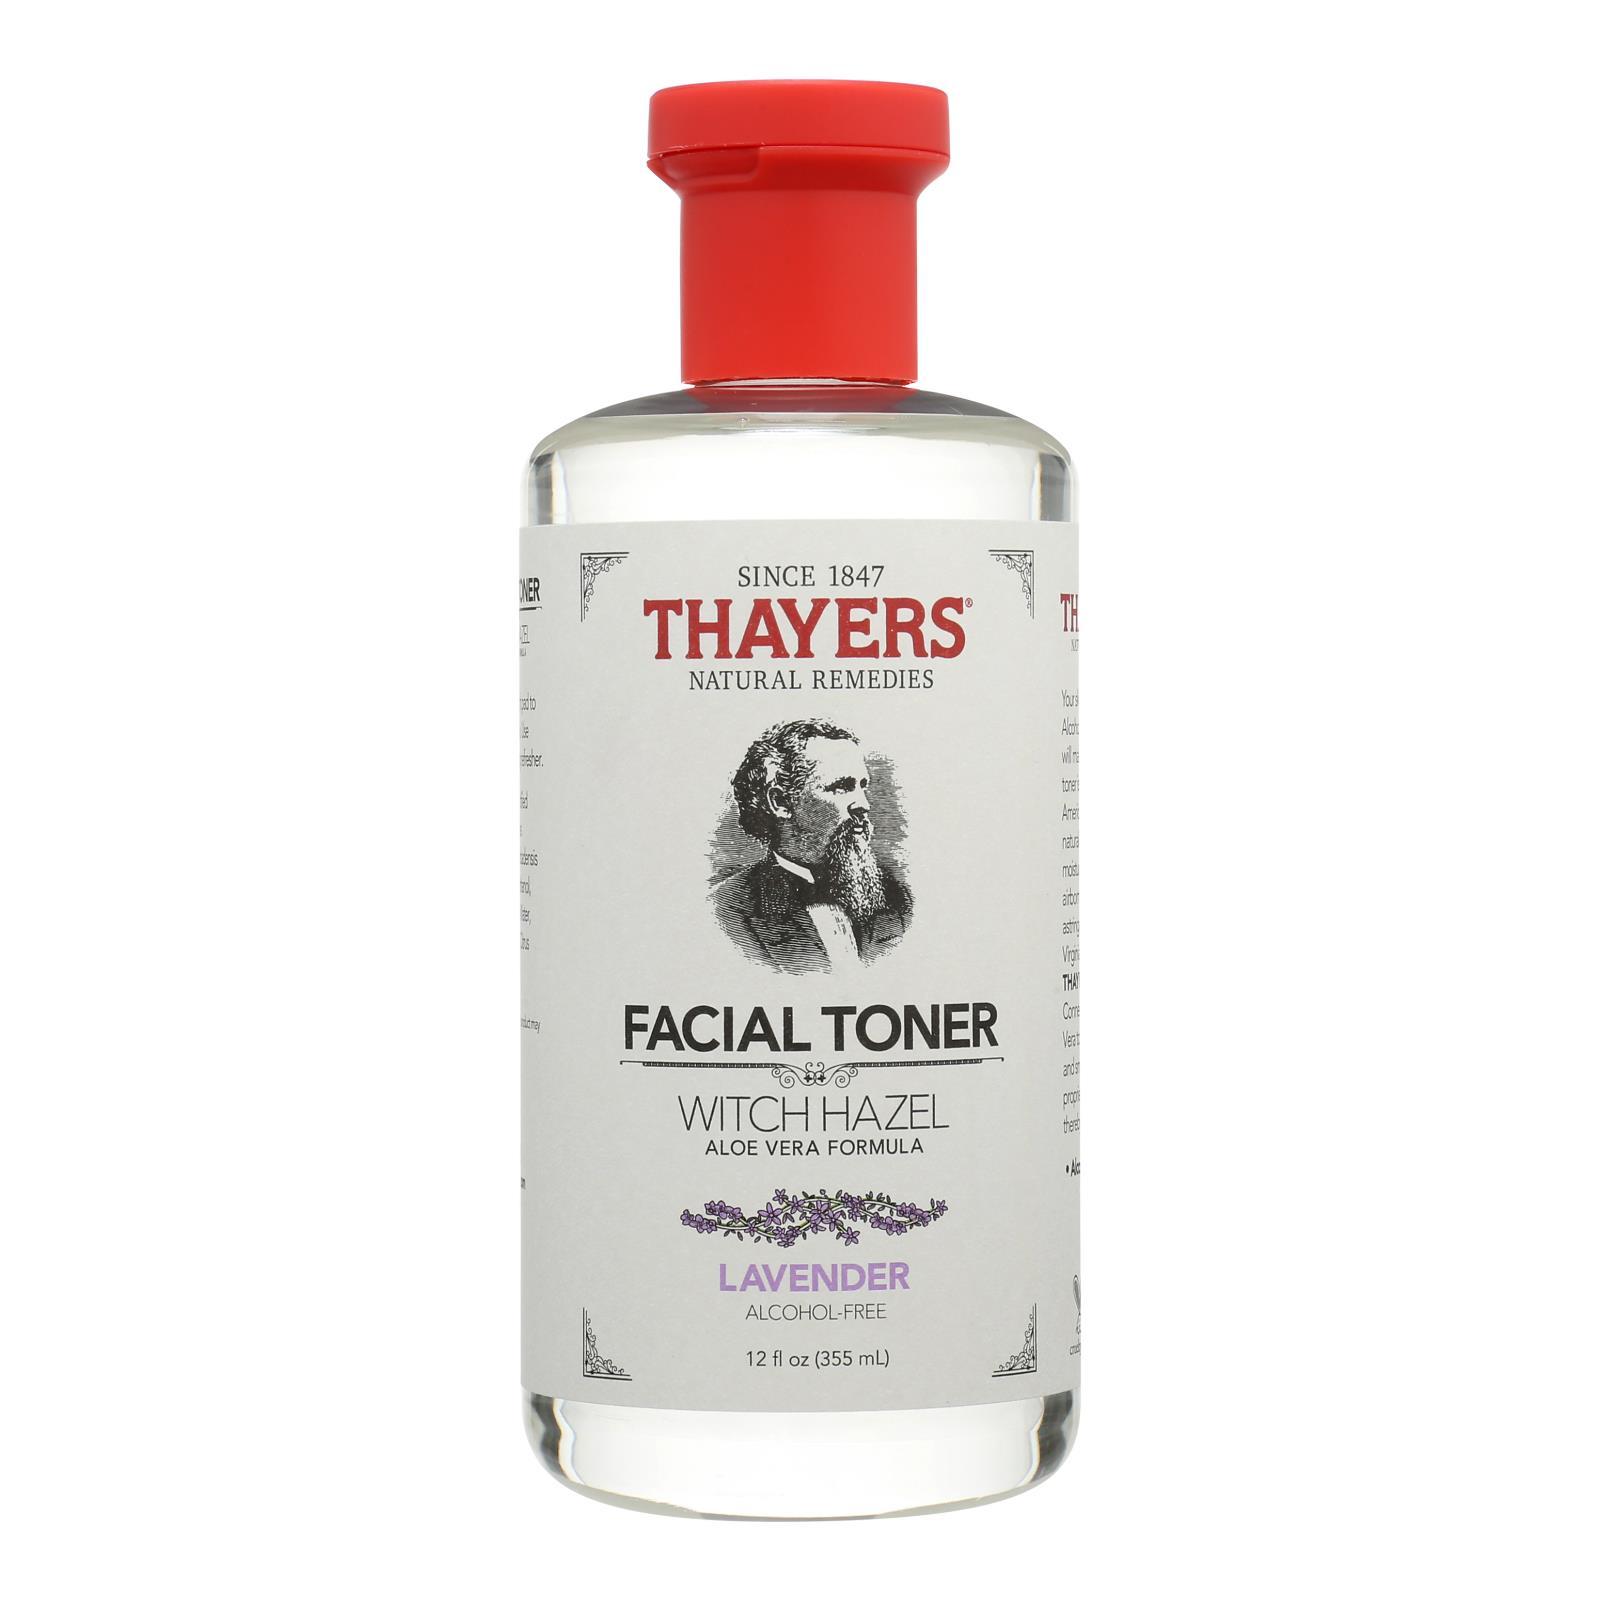 Thayers Witch Hazel with Aloe Vera Lavender - 12 fl oz